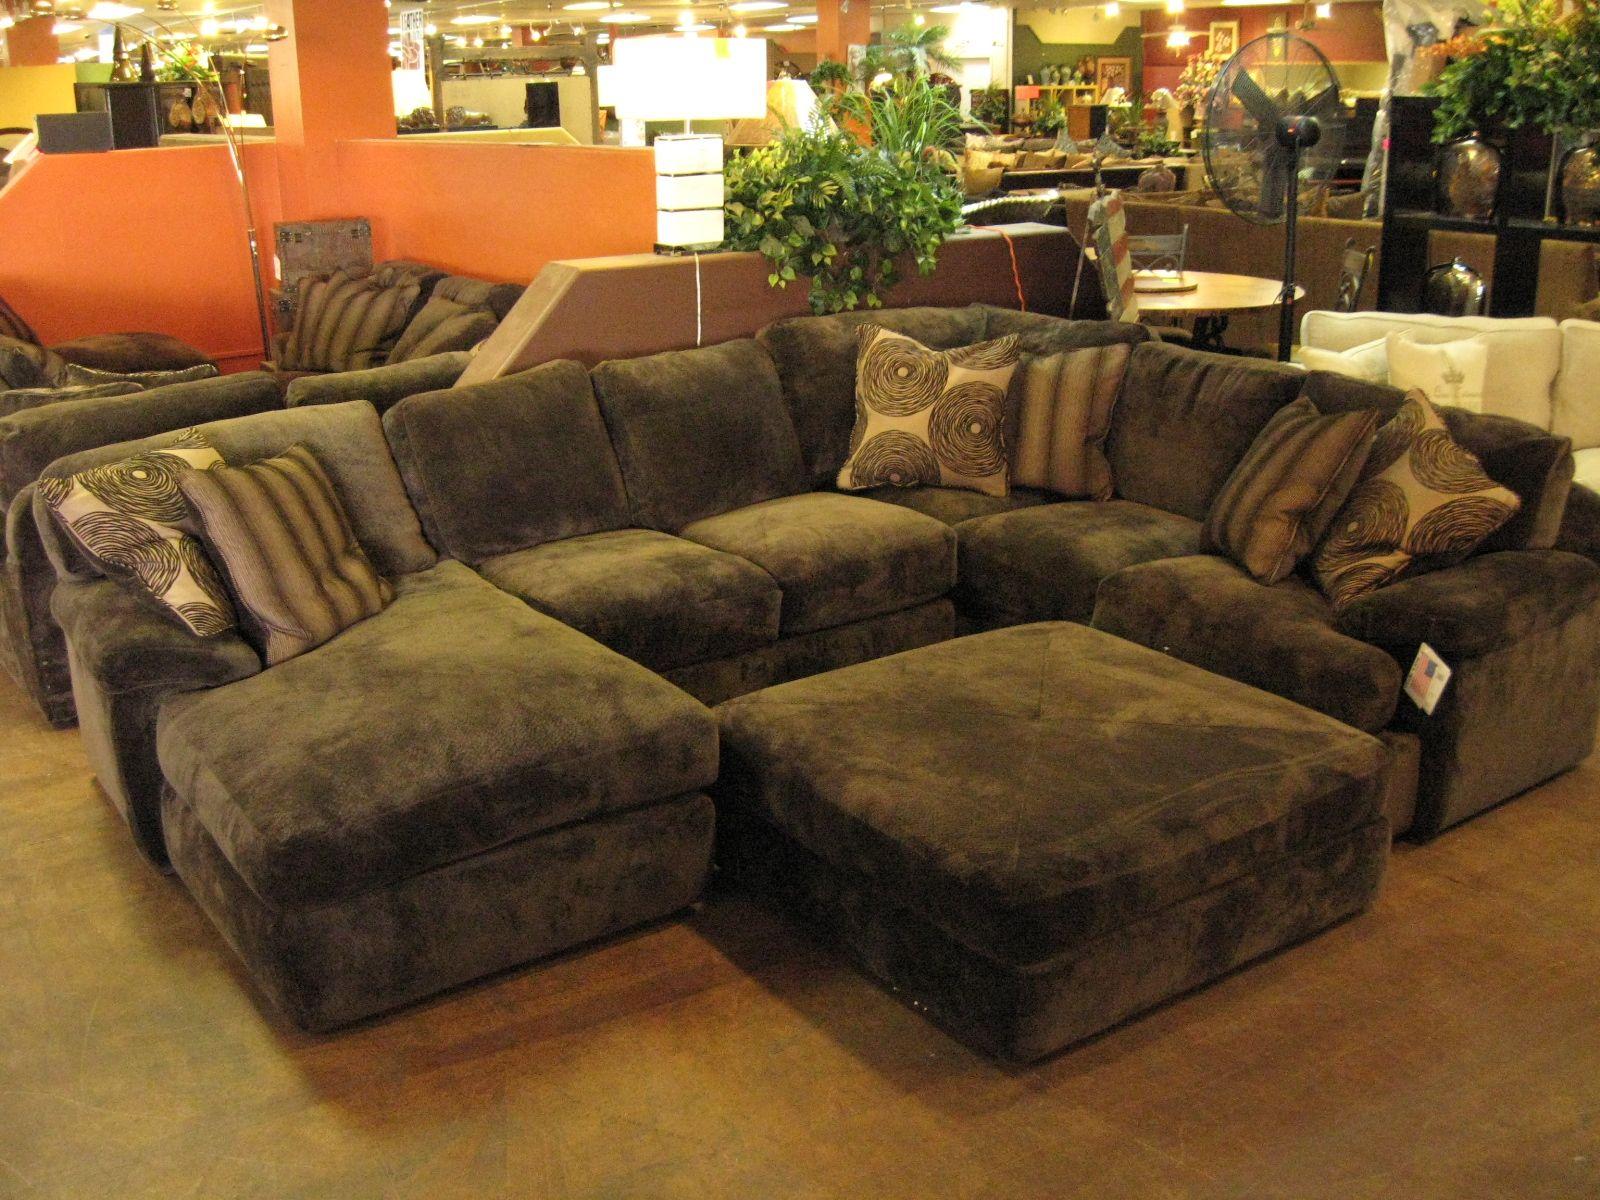 Miraculous Rustin Cabin Life Rustic Living Room Furniture Great Deals Beatyapartments Chair Design Images Beatyapartmentscom